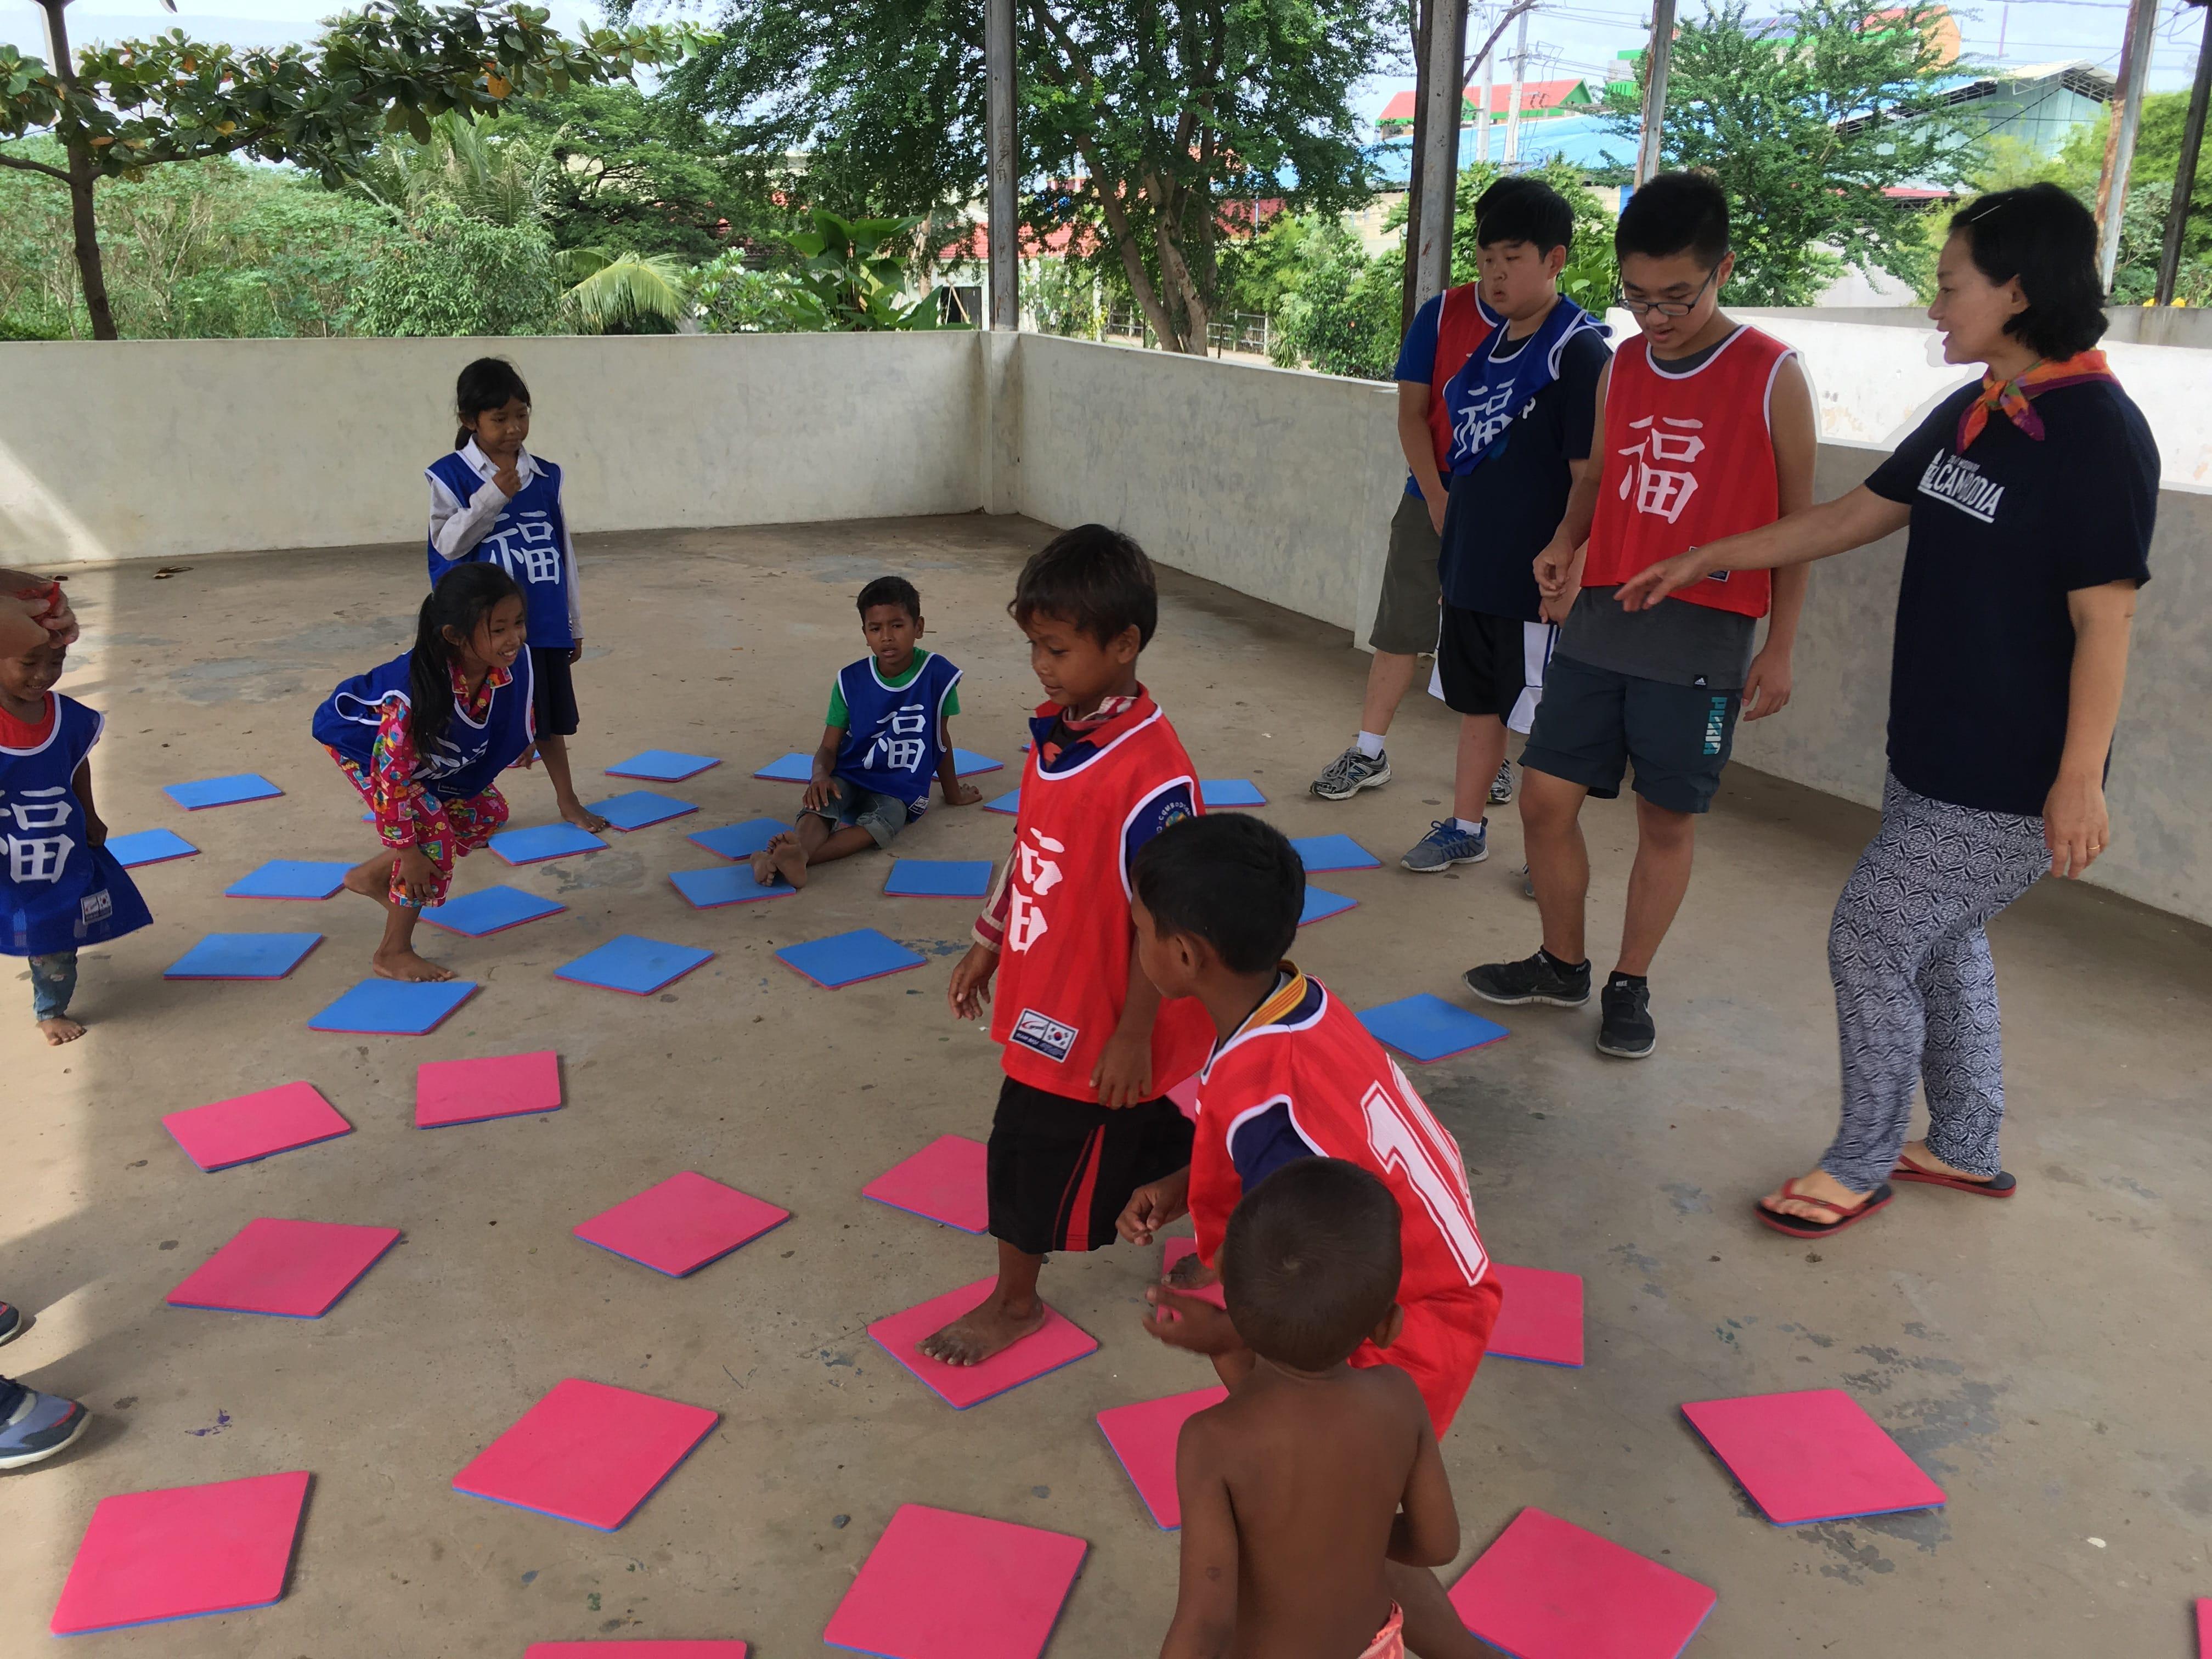 6021bed21b7acd 2017 캄보디아 아웃리치   Cambodia Outreach - 밴쿠버 GDEW 열방교회